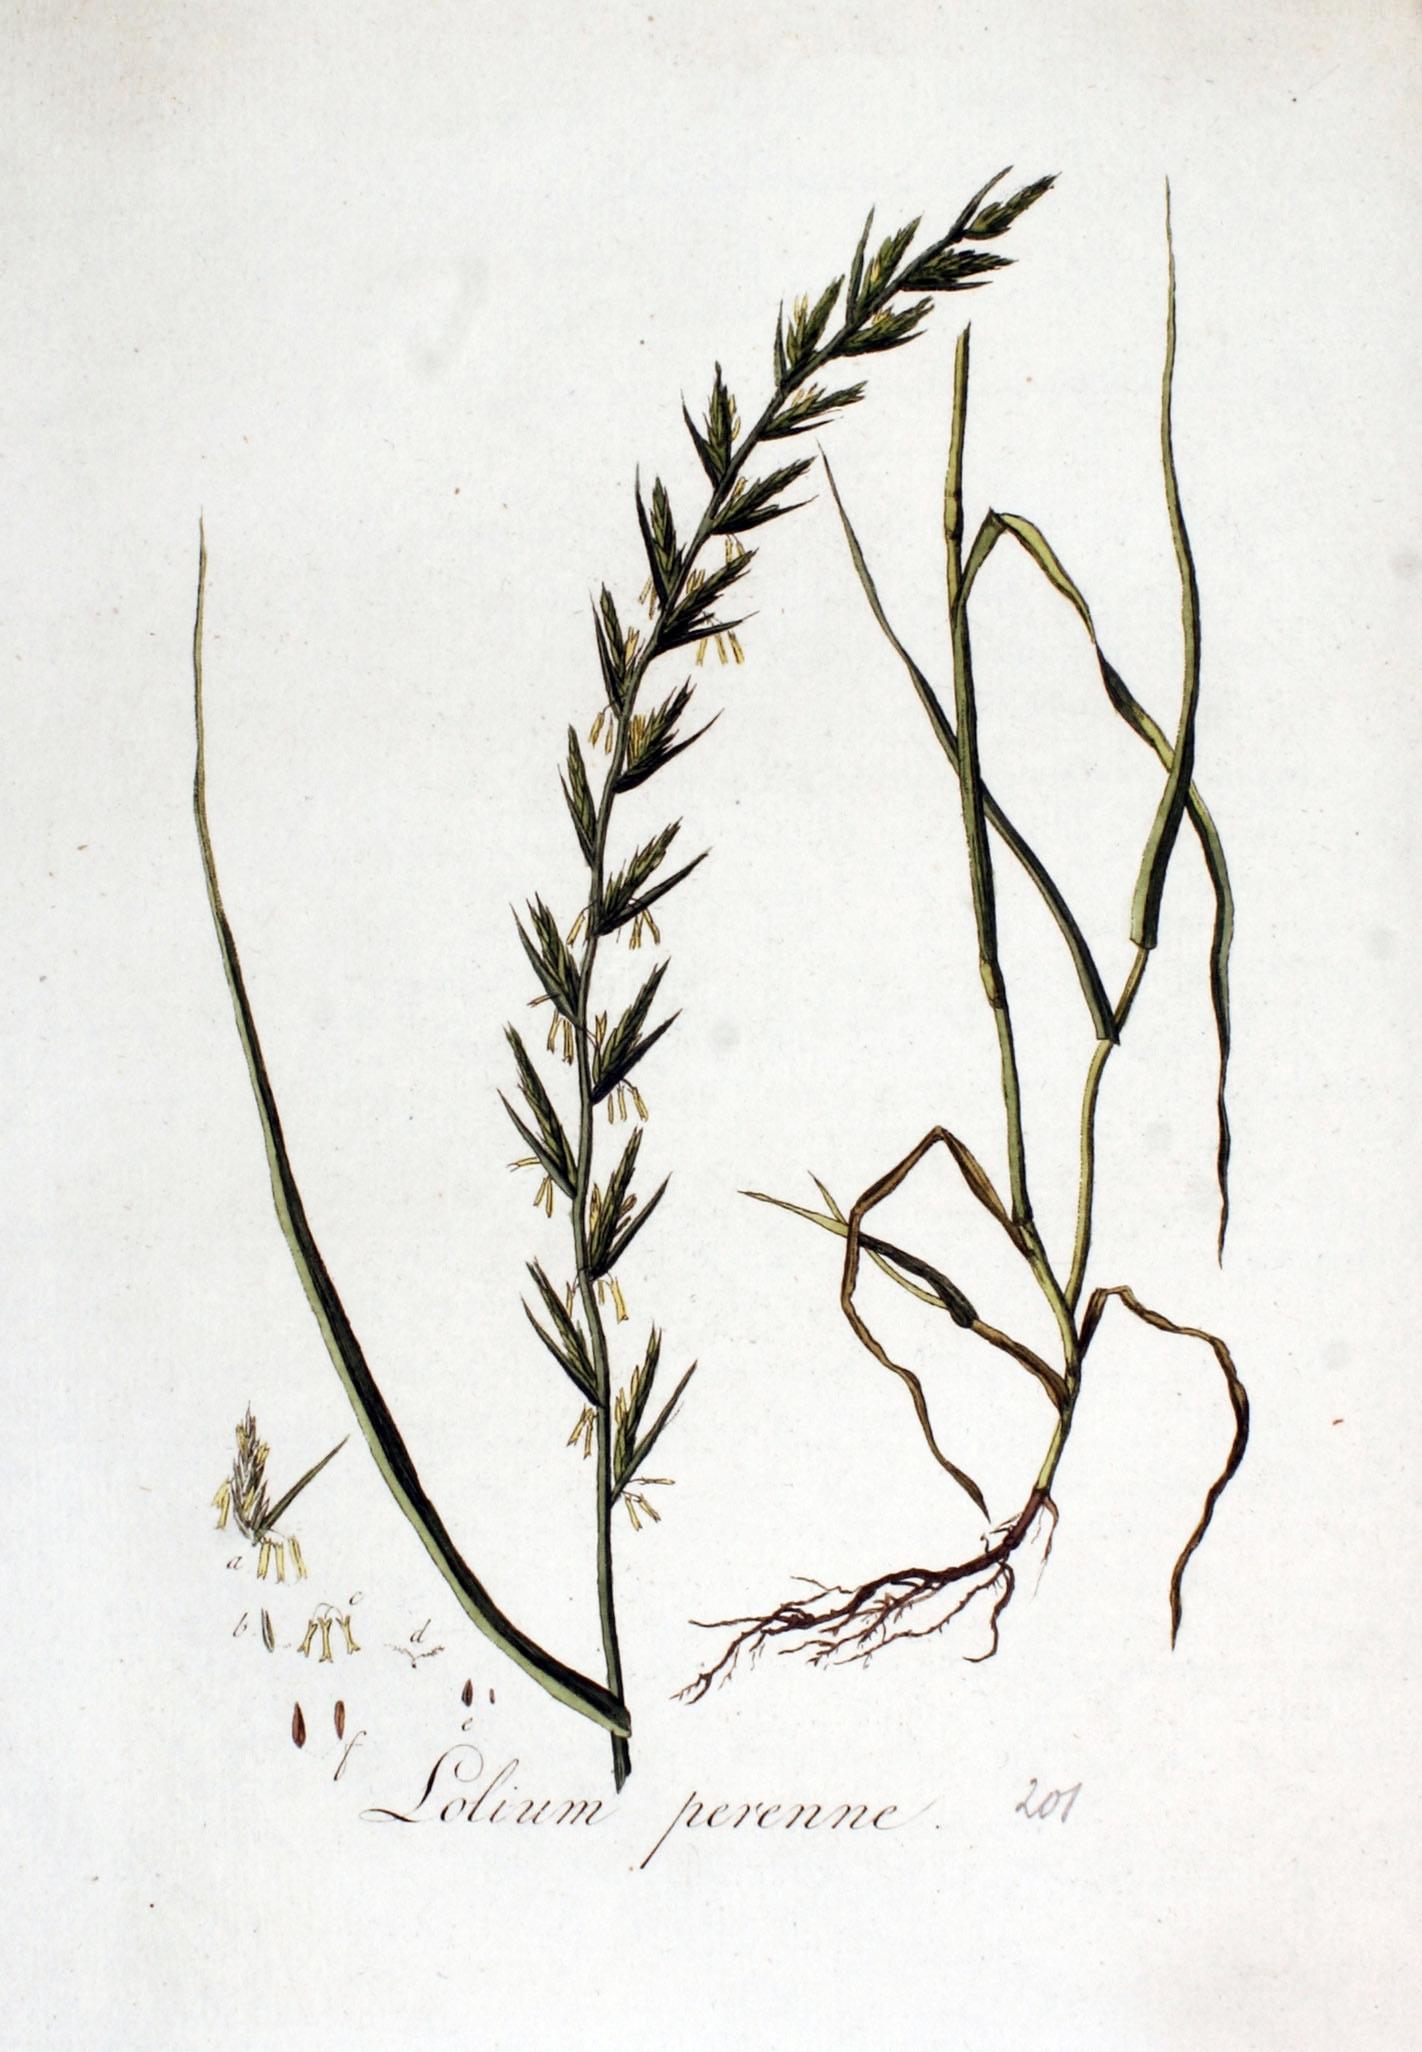 Image:    Lolium perenne , image via Wikimedia Commons.